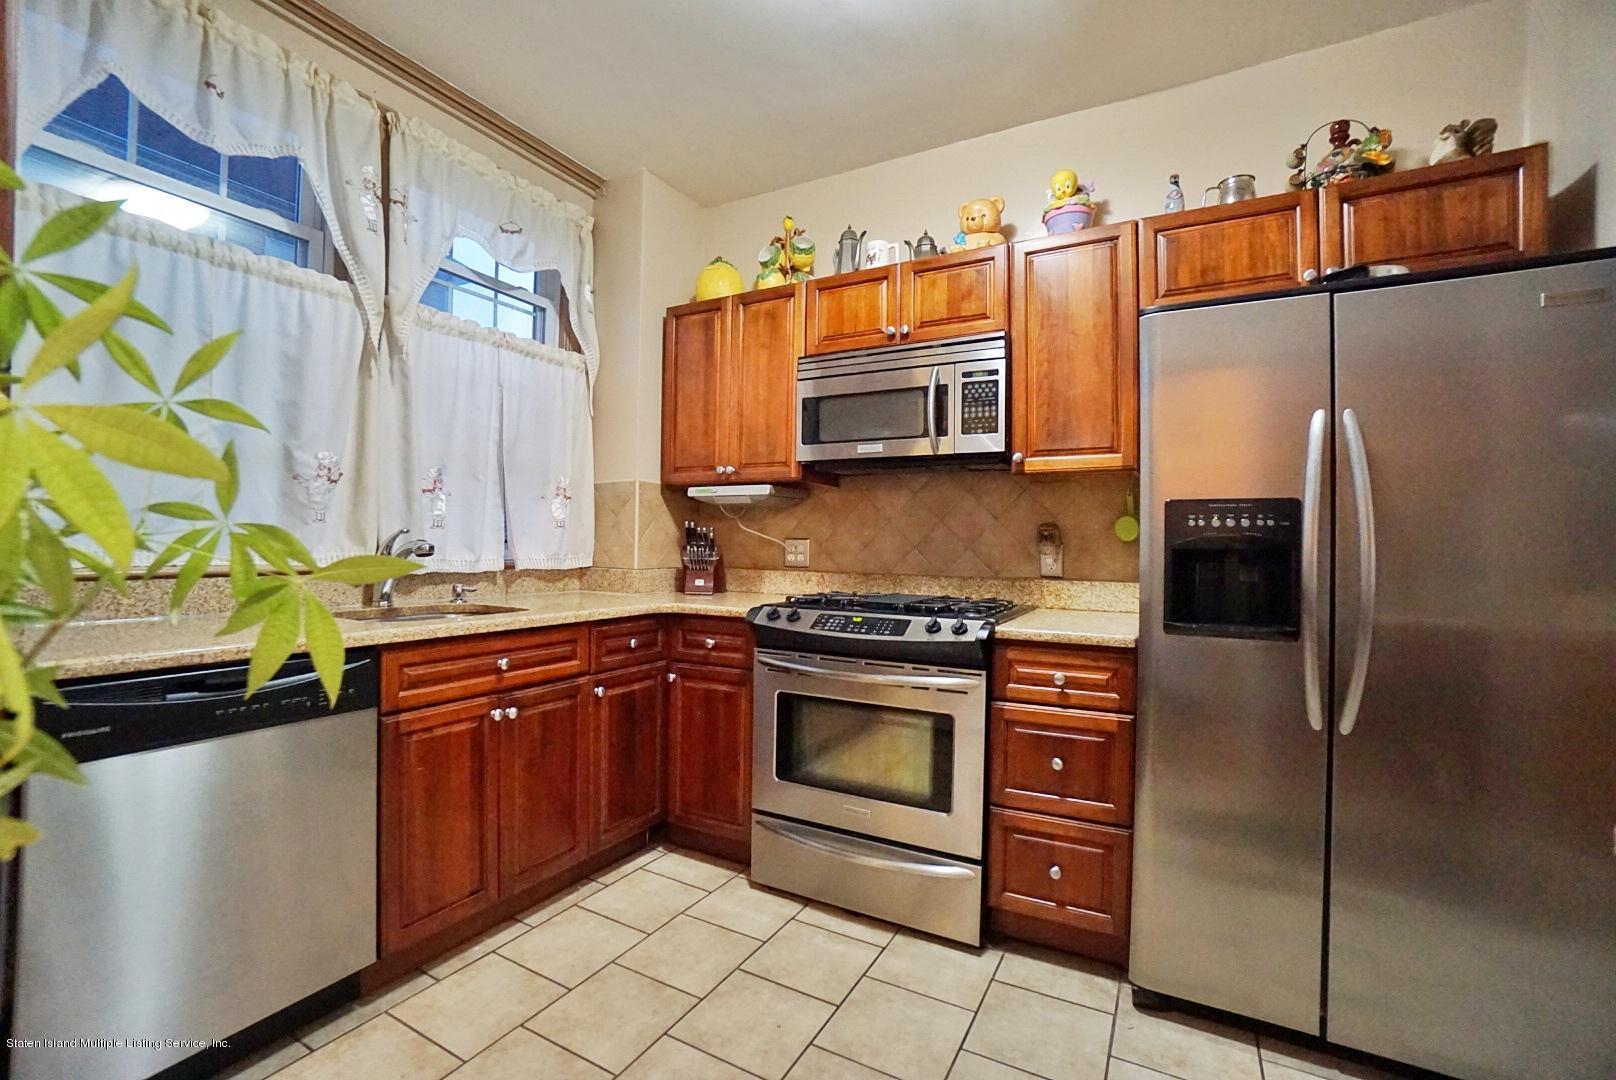 Single Family - Detached 31 Pelton Avenue  Staten Island, NY 10310, MLS-1132177-13